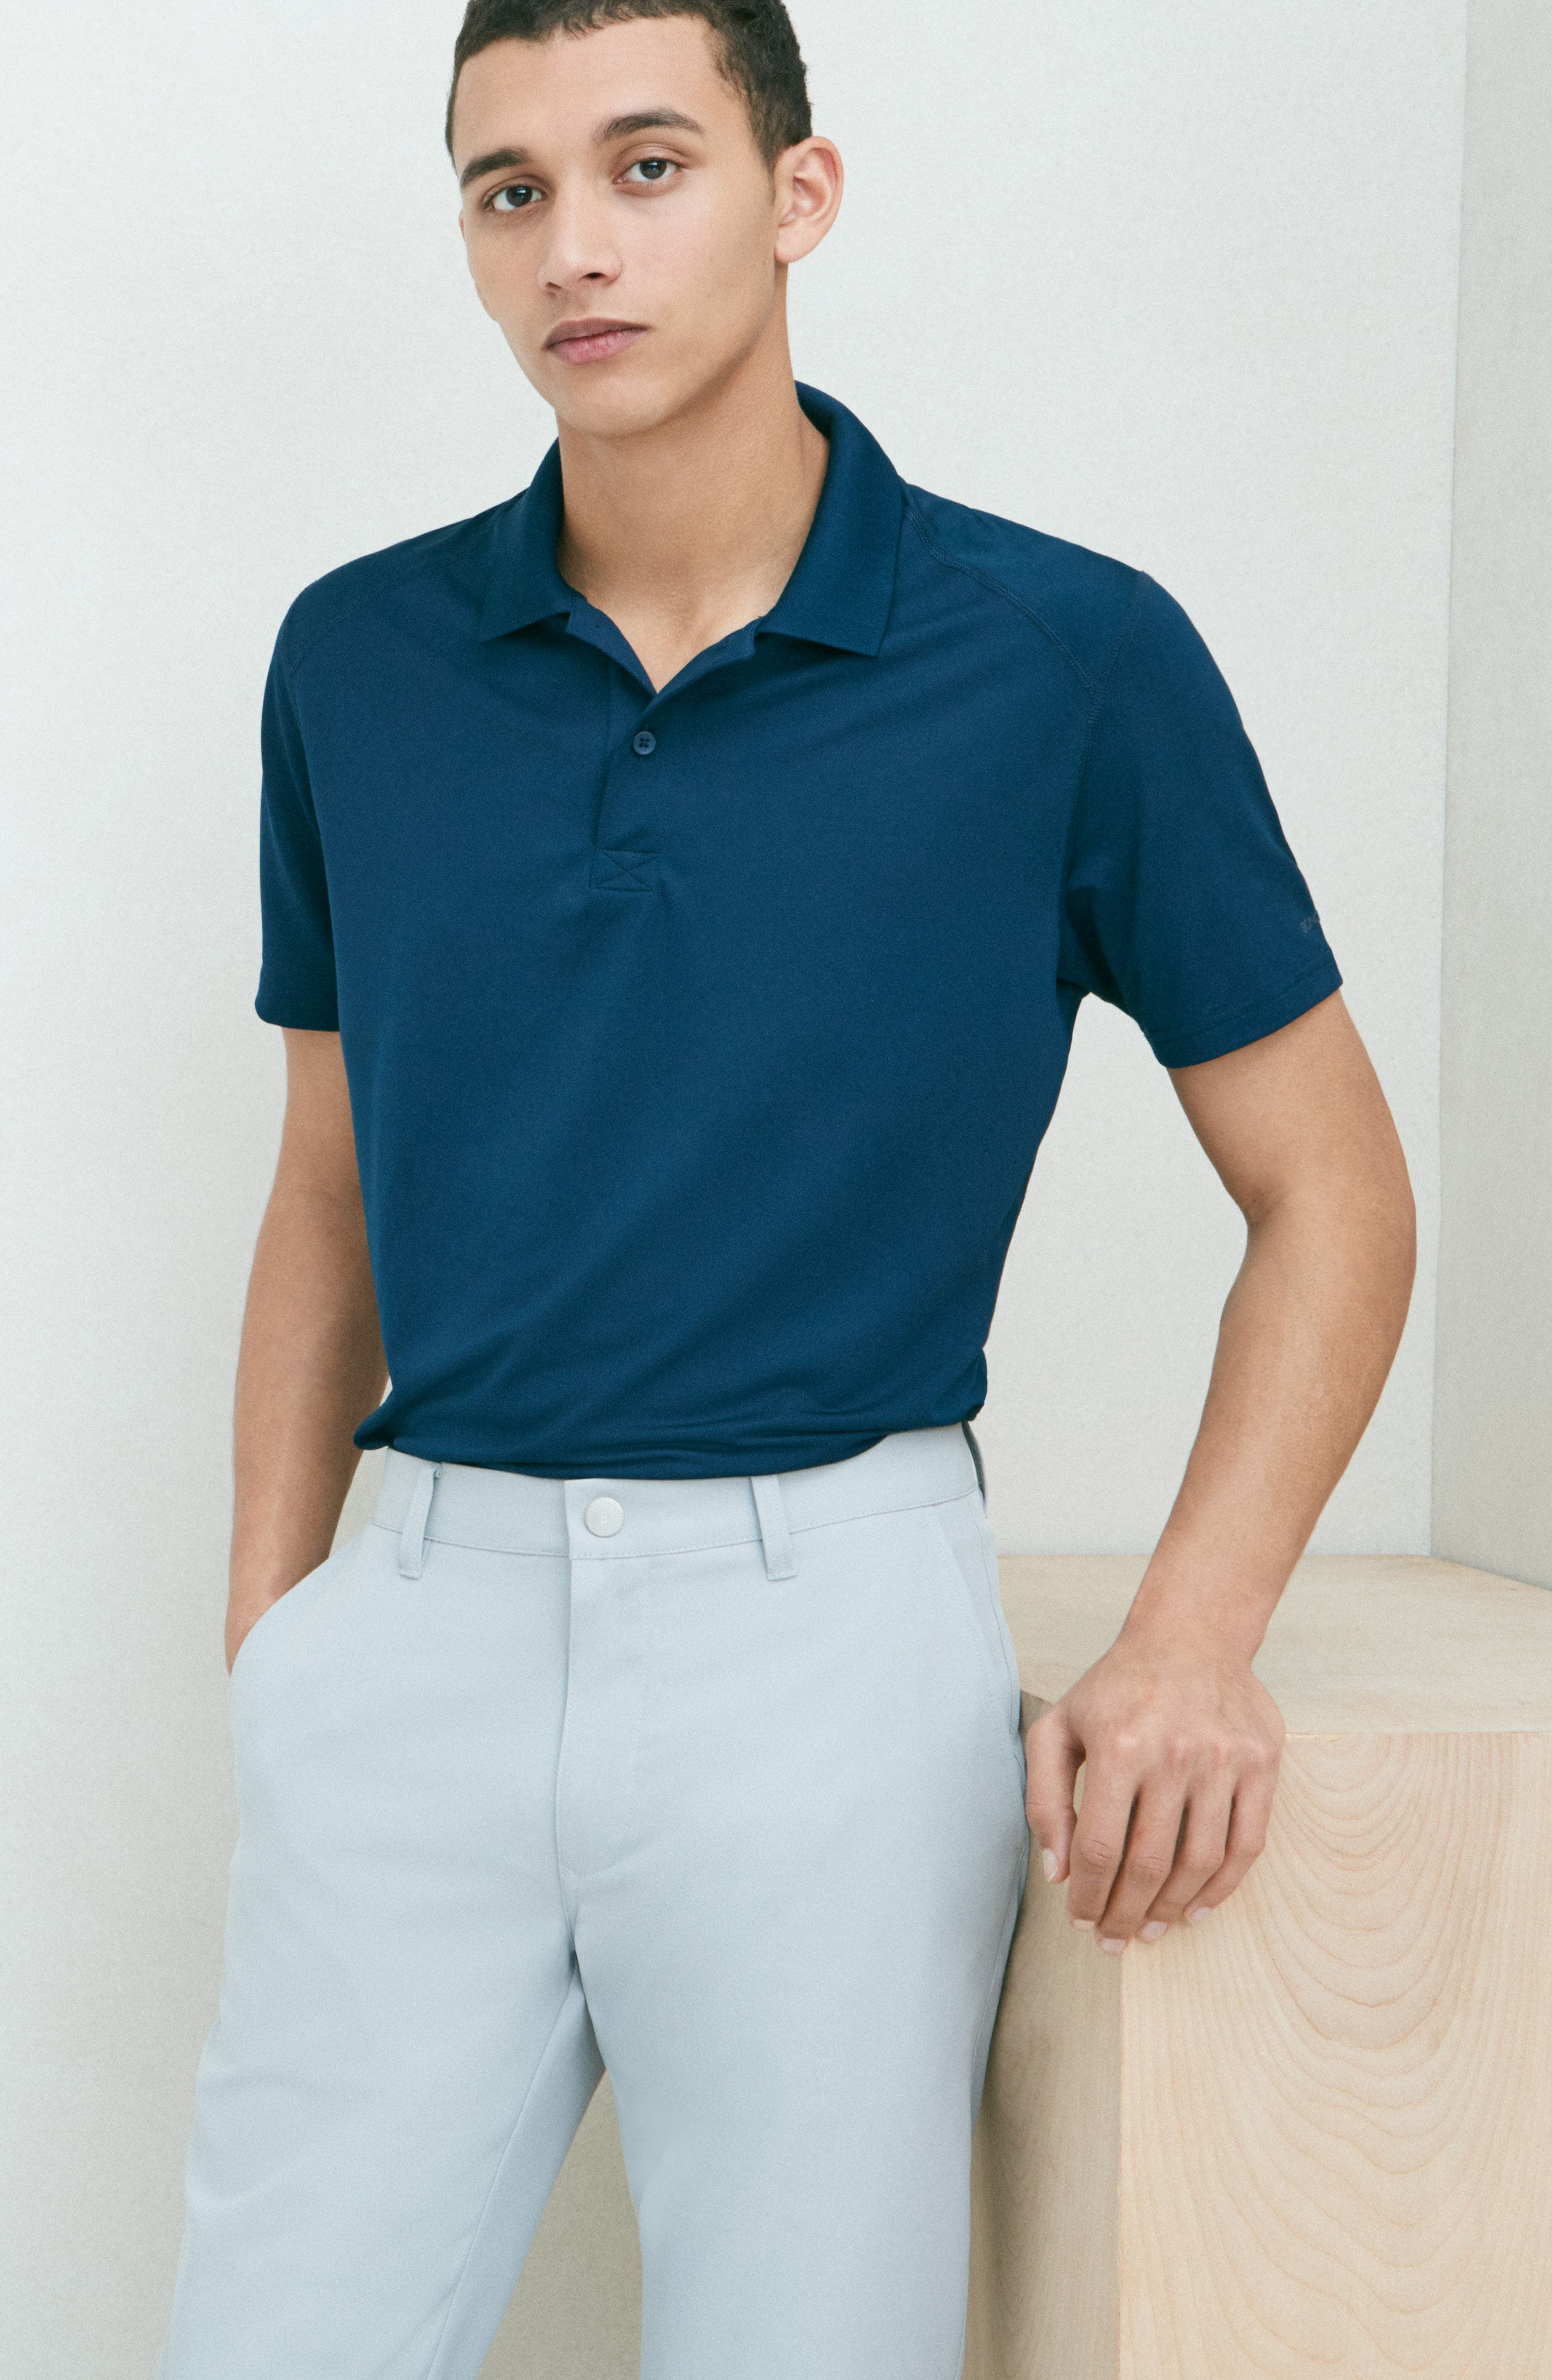 M-Flex Flatiron Slim Fit Golf Polo,                             Alternate thumbnail 7, color,                             SKY BLUE